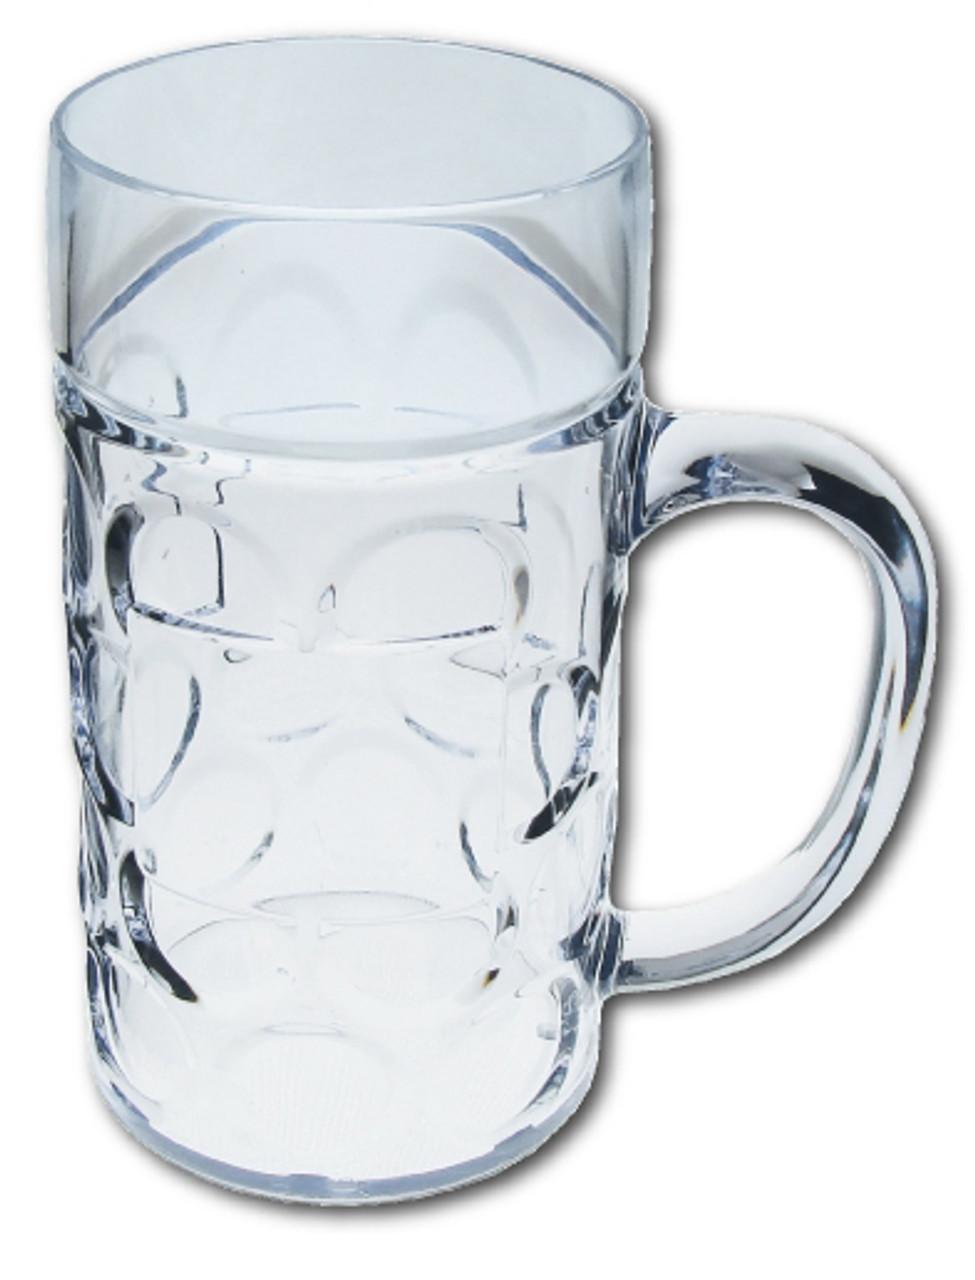 Plastic Beer Mug 24 Pack 0.5 Liter